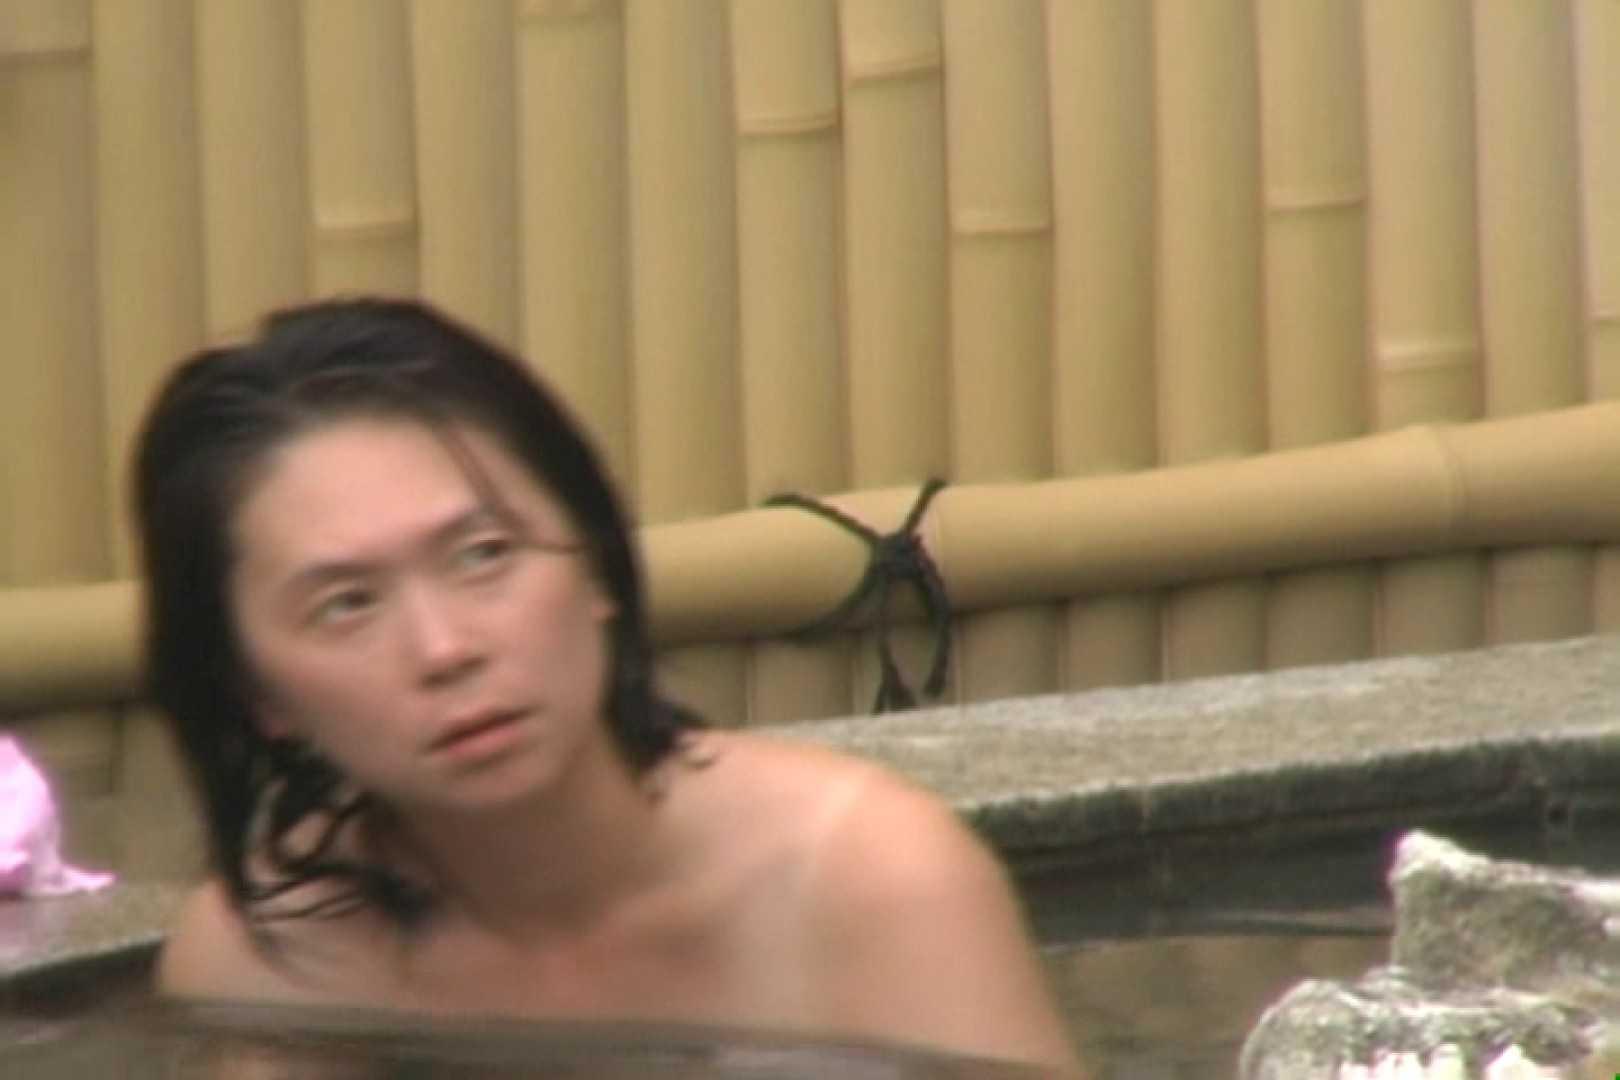 Aquaな露天風呂Vol.619 盗撮シリーズ | 露天風呂編  75PIX 57